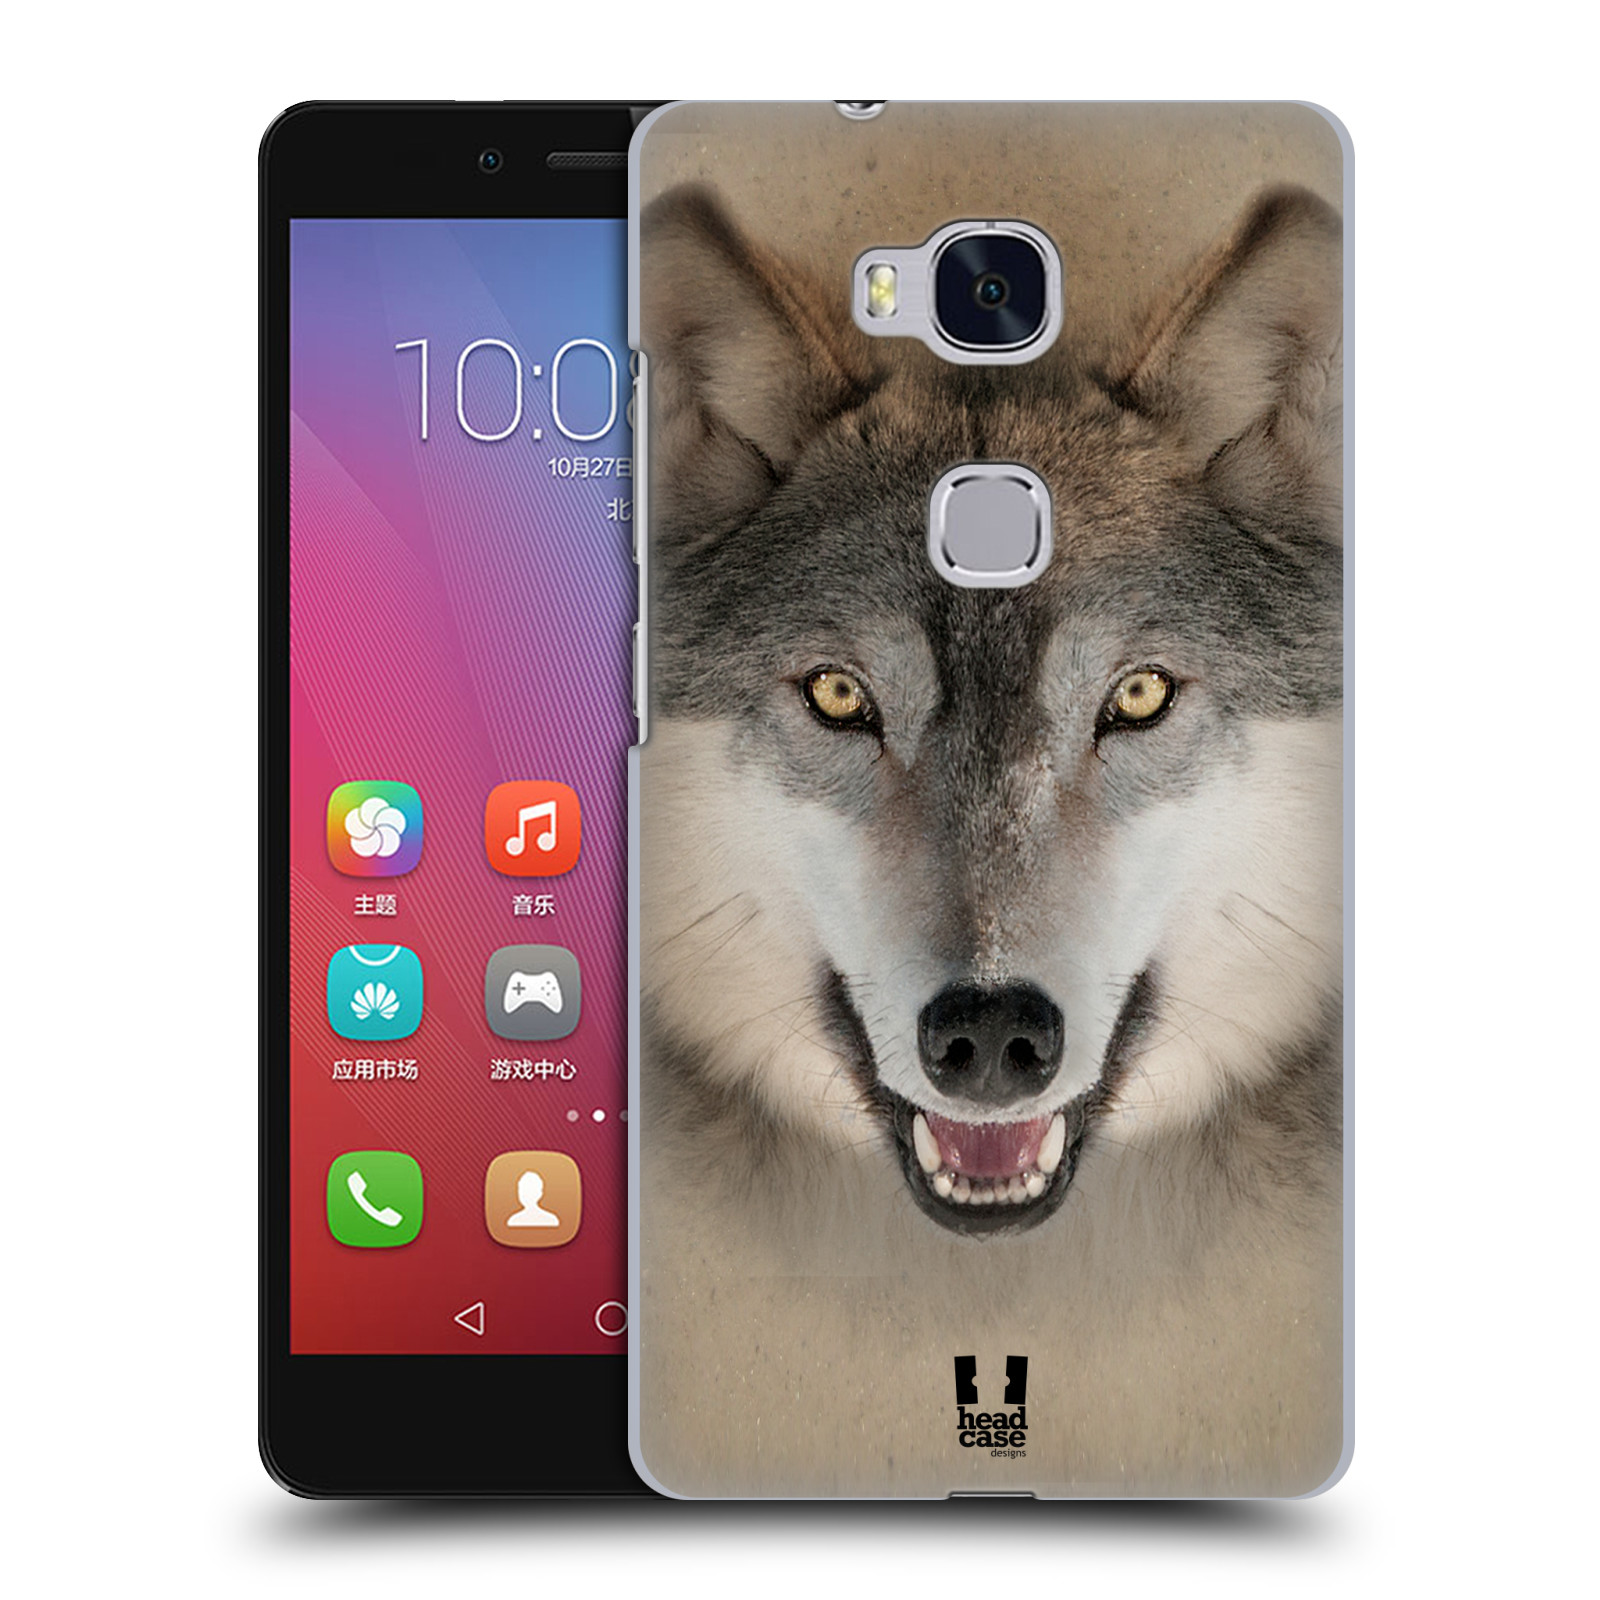 HEAD CASE pevný plastový obal na mobil HUAWEI HONOR 5X vzor Zvířecí tváře 2 vlk šedý